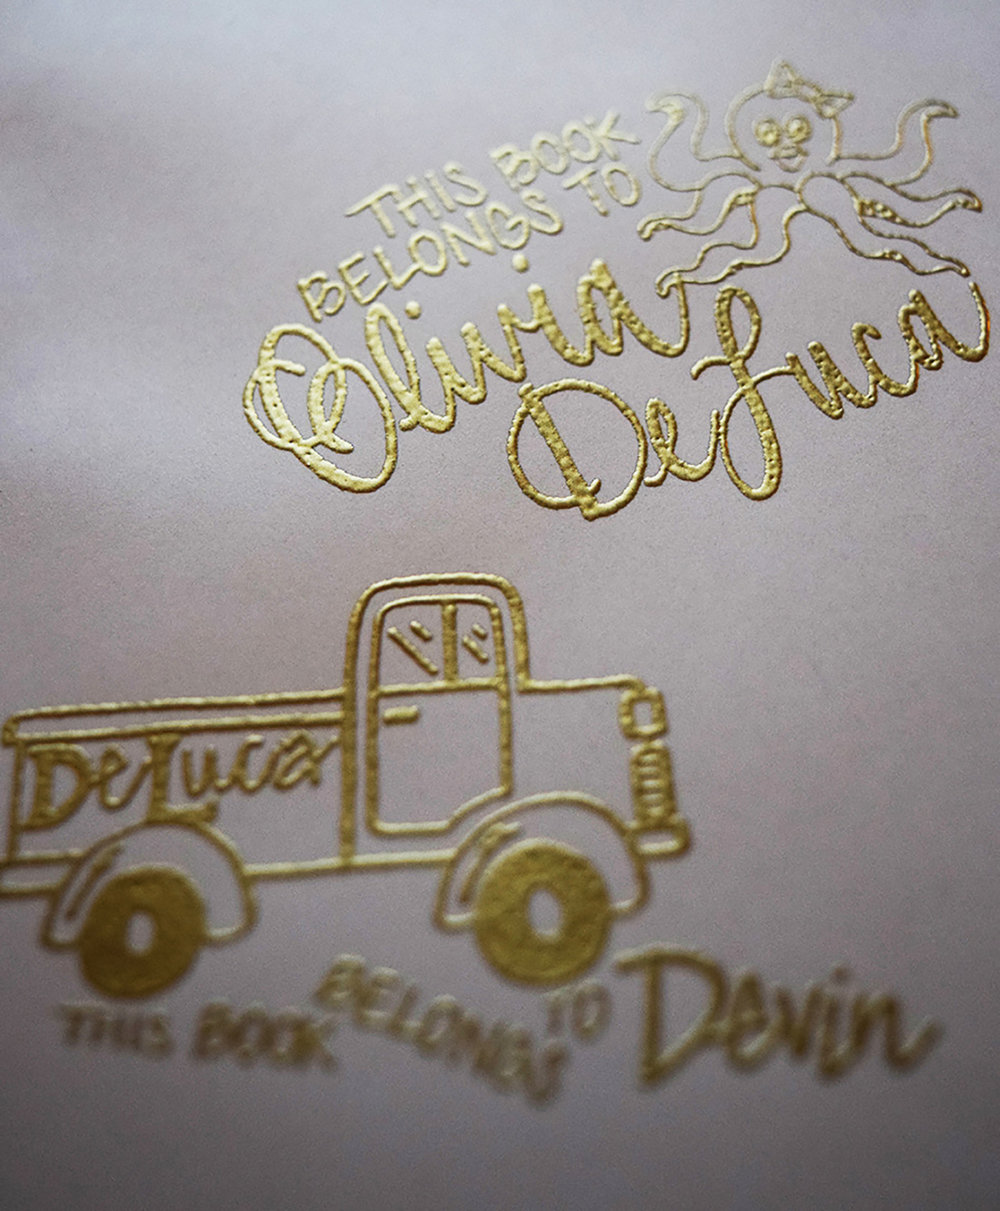 DeLuca Book Stamps_web.jpg